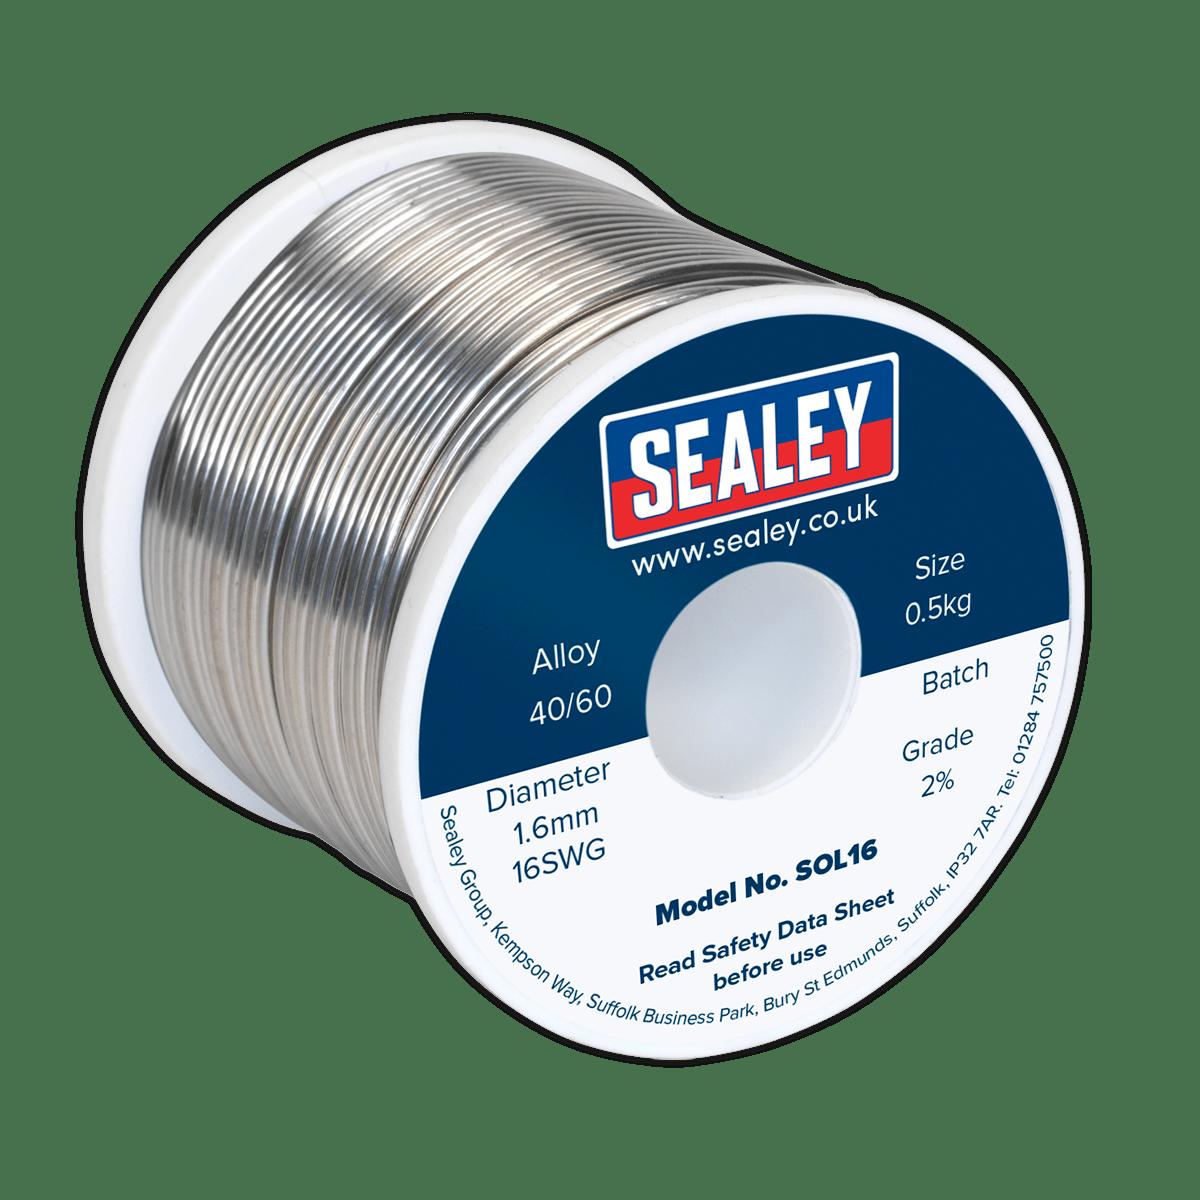 Sealey Solder Wire Quick Flow 1.6mm/16SWG 40/60 0.5kg Reel SOL16